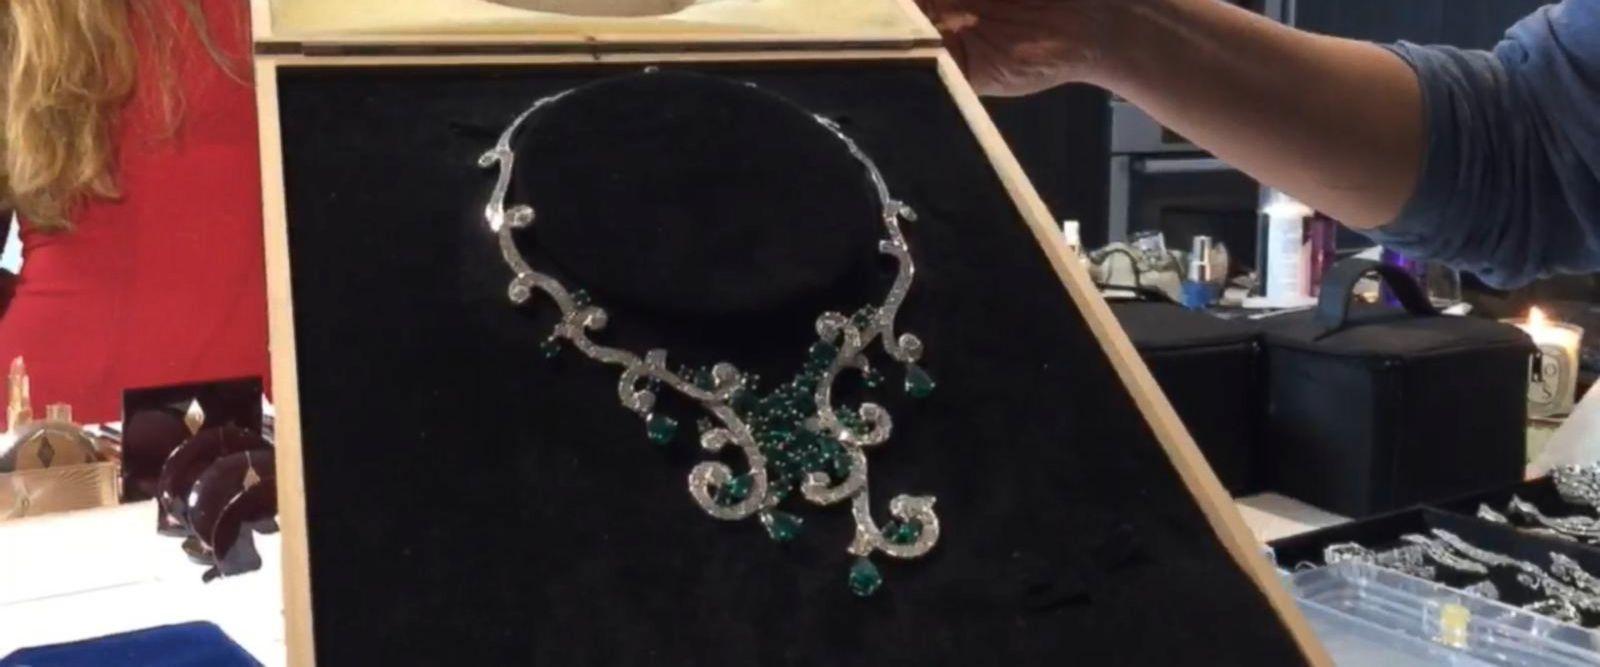 VIDEO: Supermodel Shanina Shaik on social media and her Oscars jewelry